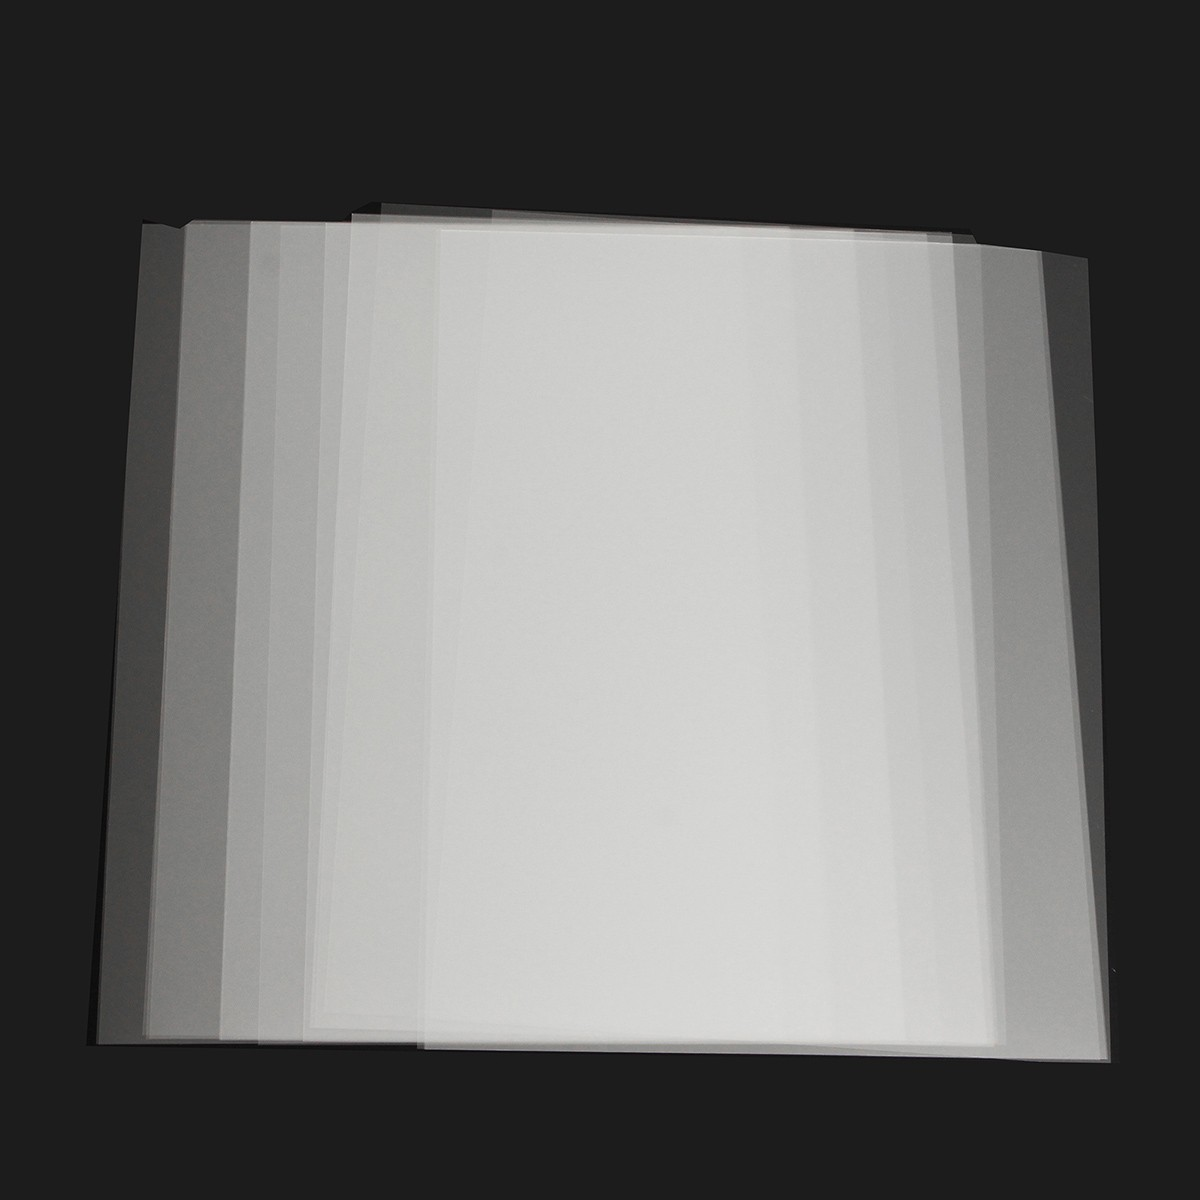 20 Sheet A4 Screen Printing Transparency Inkjet Film Paper